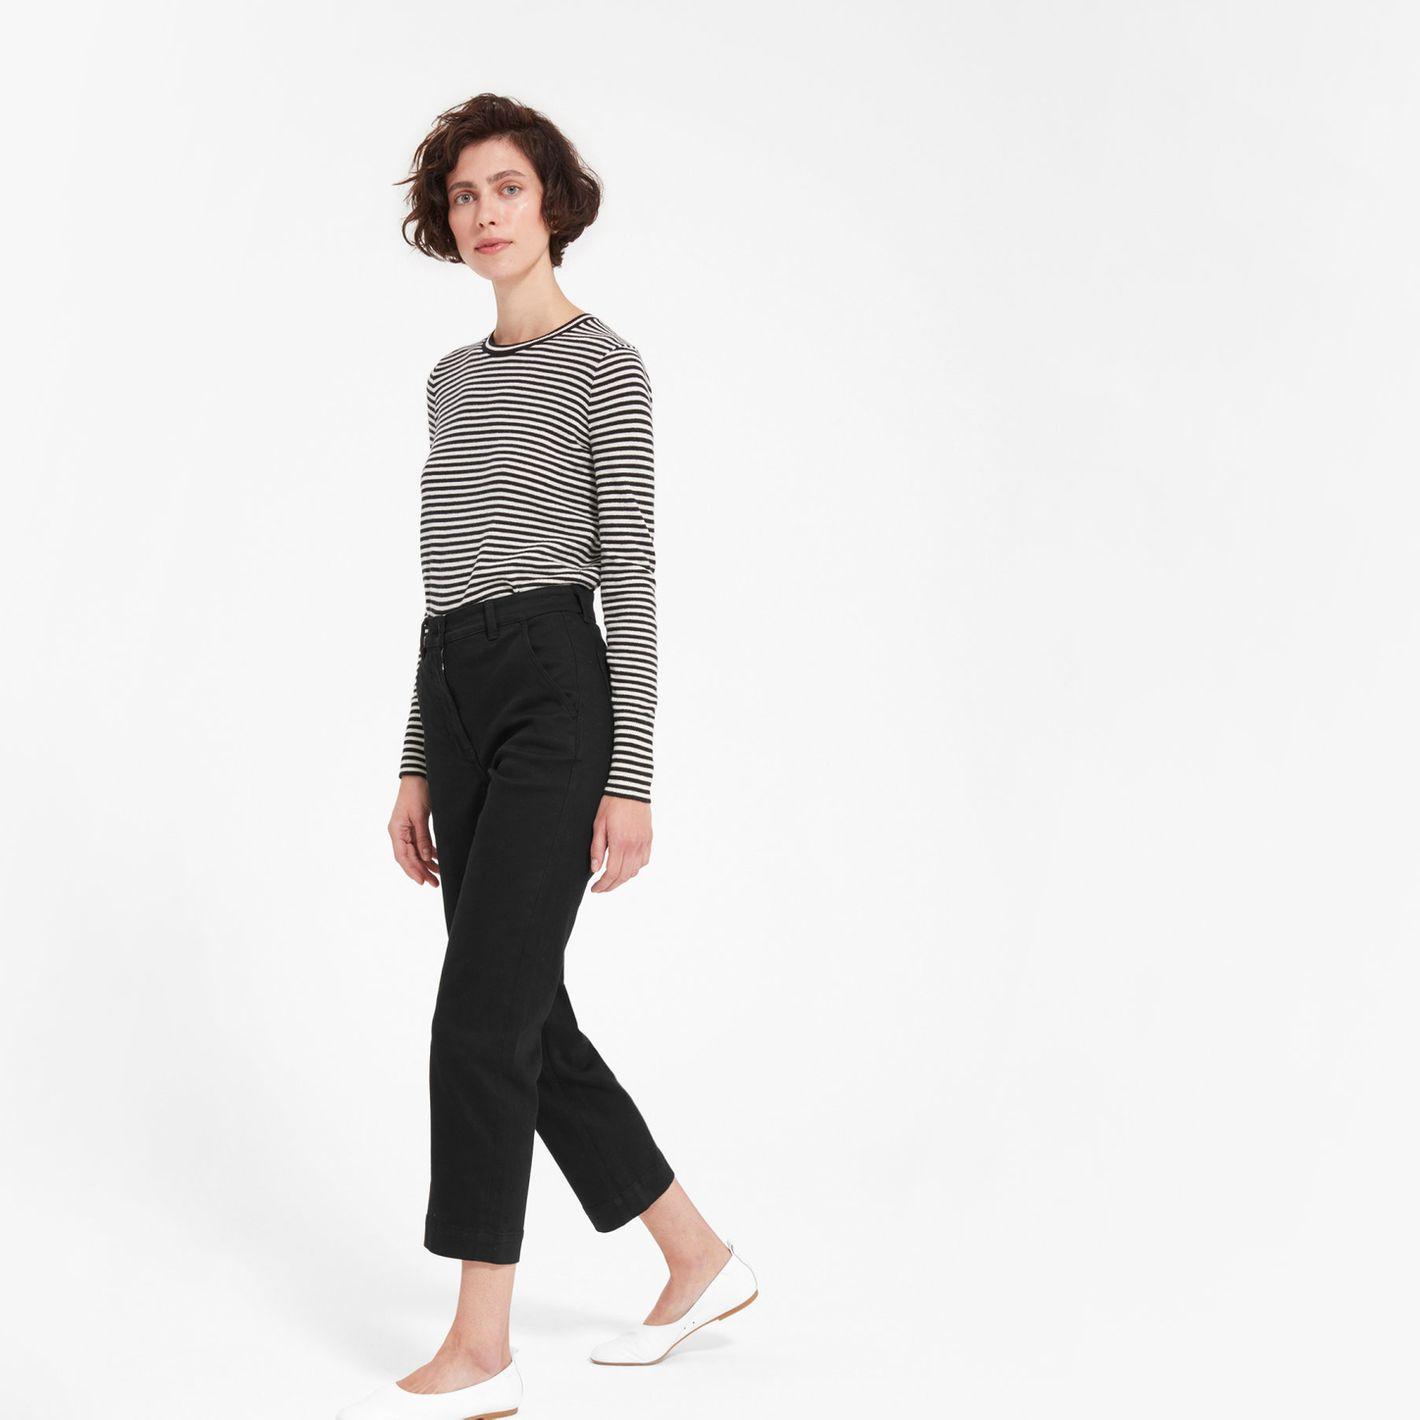 Everlane Women's Straight Leg Crop Pant, Black